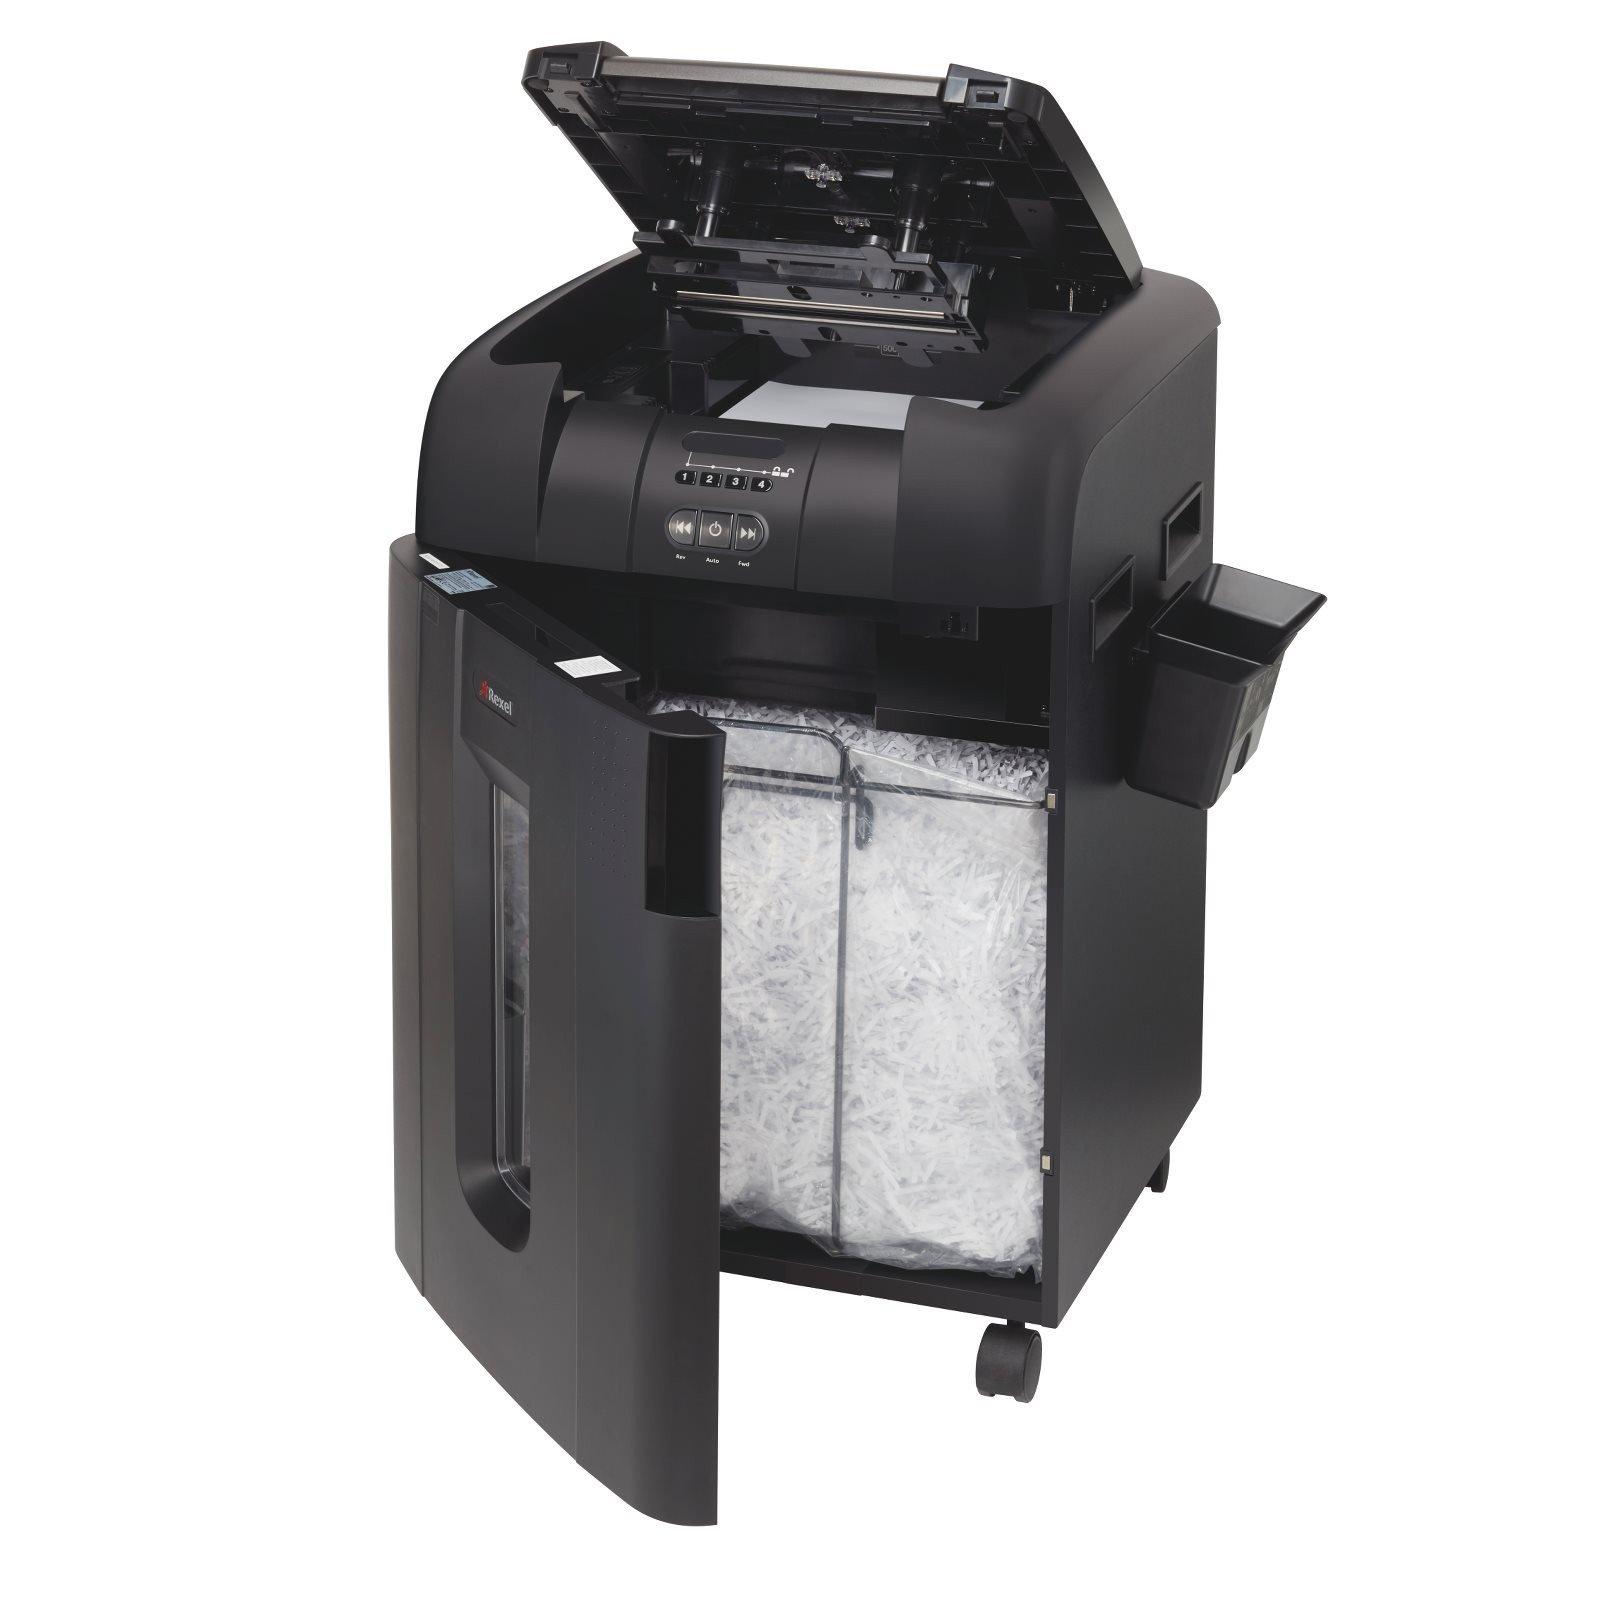 shredder large office auto 600x cross cut shredder. Black Bedroom Furniture Sets. Home Design Ideas